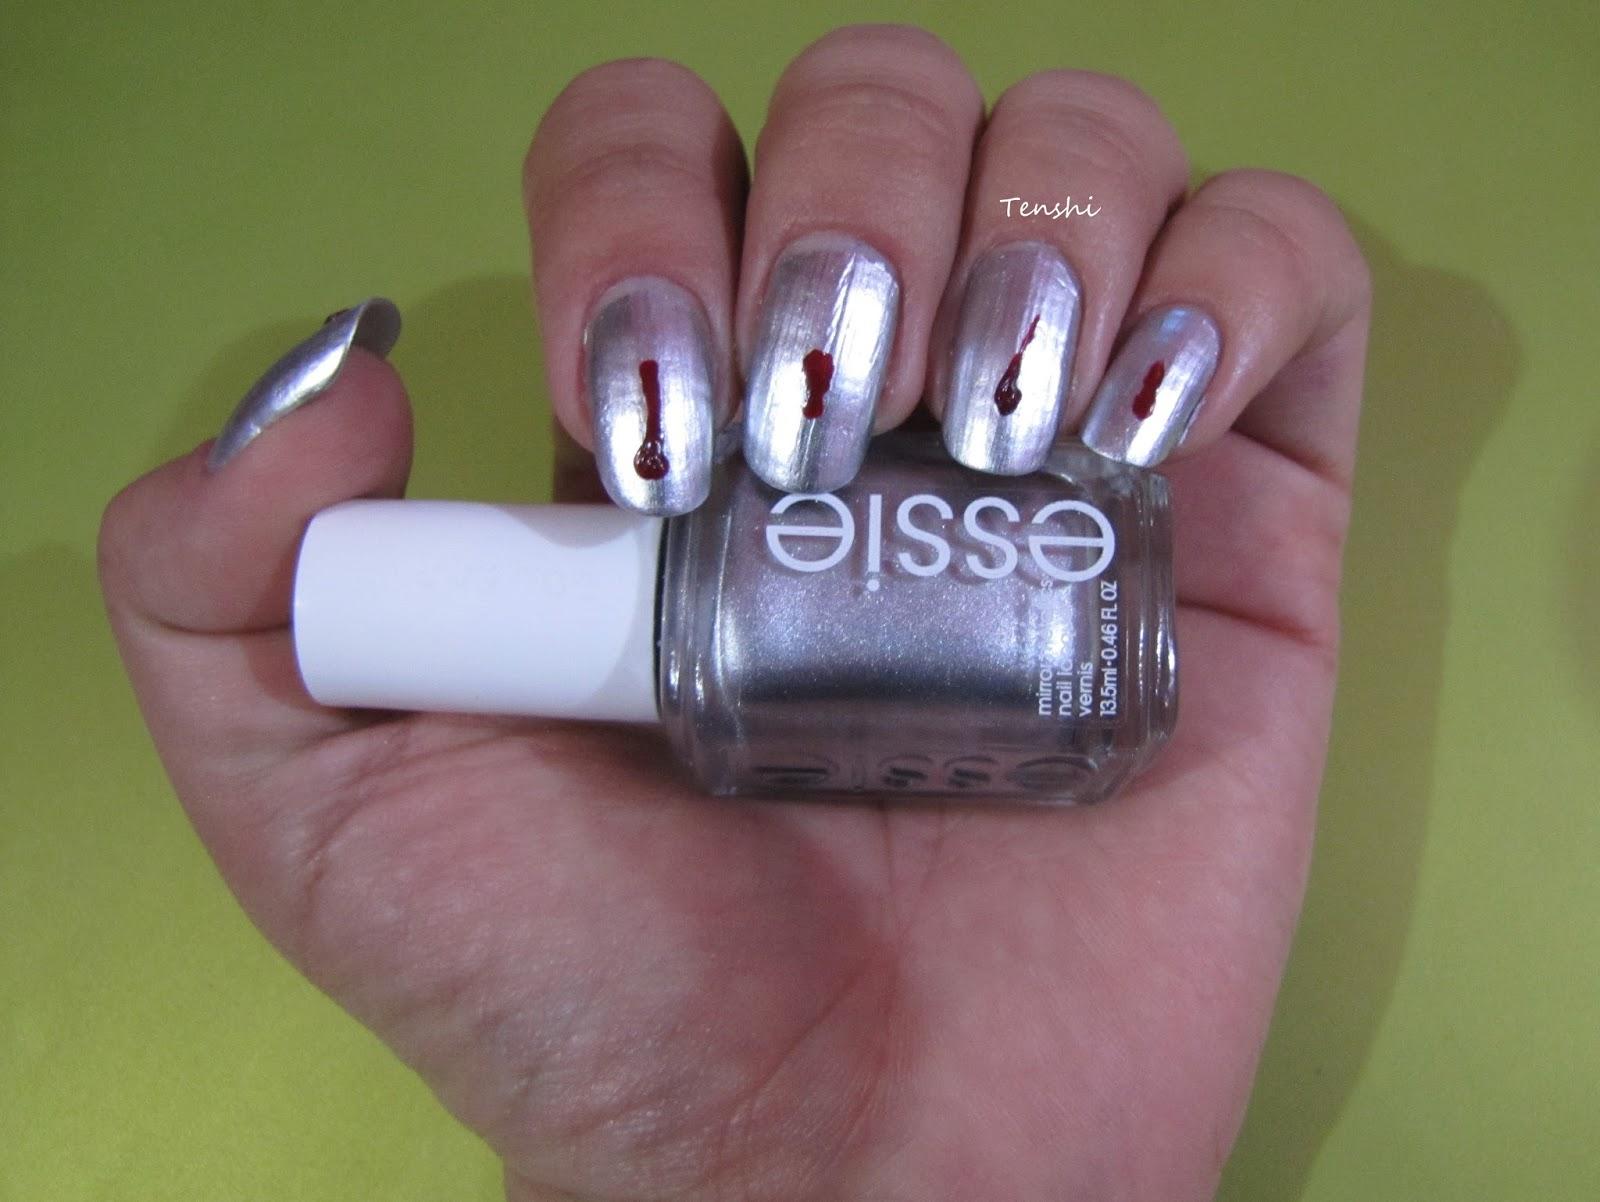 Nails by Tenshi: 31 días de uñas: Día 24, inspirado en un libro